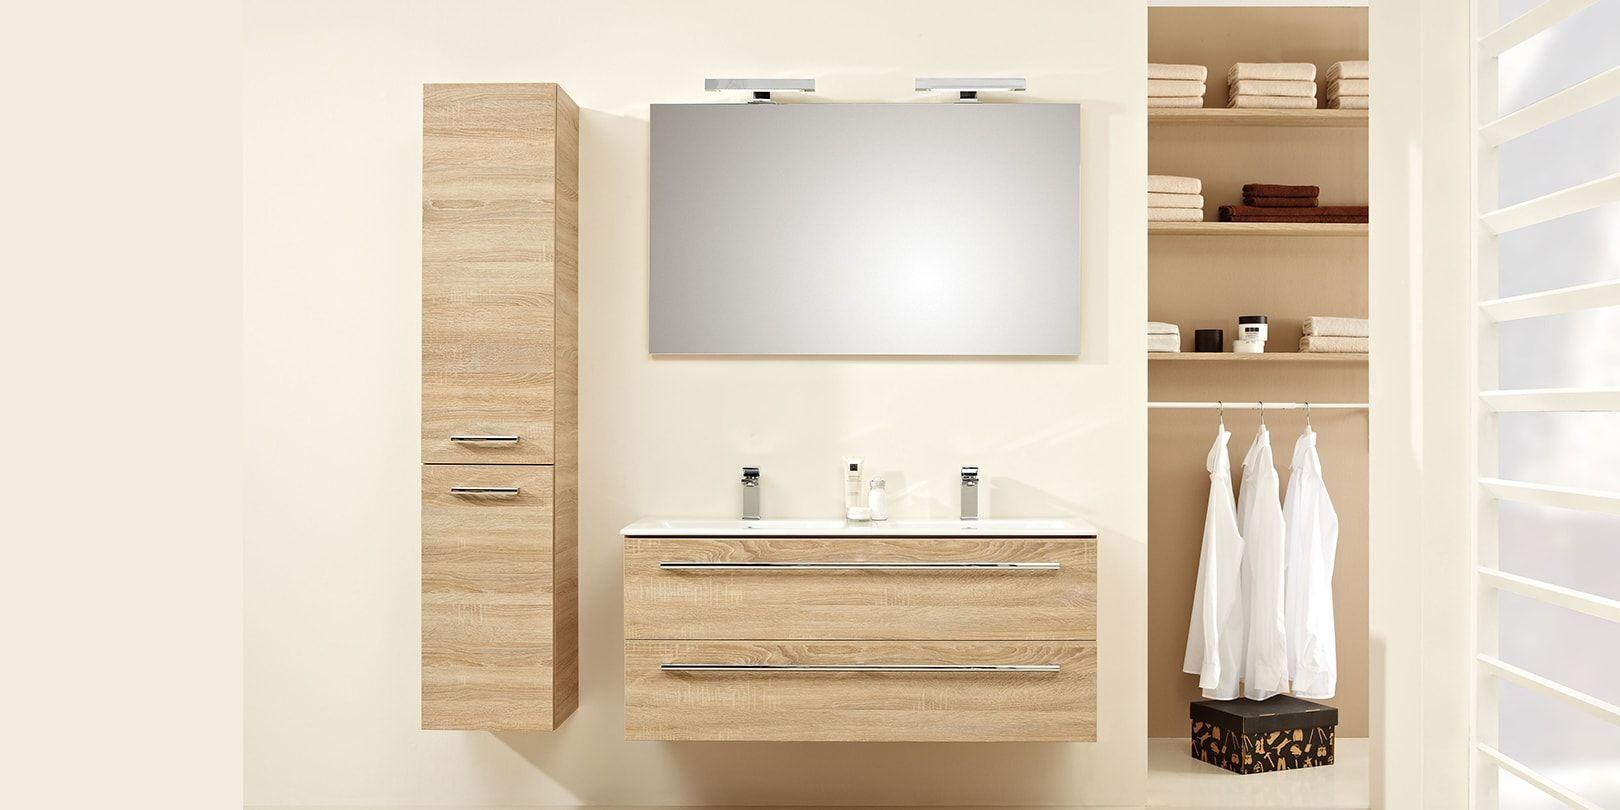 Modern badkamer meubel in hout kleur met extra dunne wastafel en bijpassende hoge kast ideaal - Moderne badkamer meubels ...